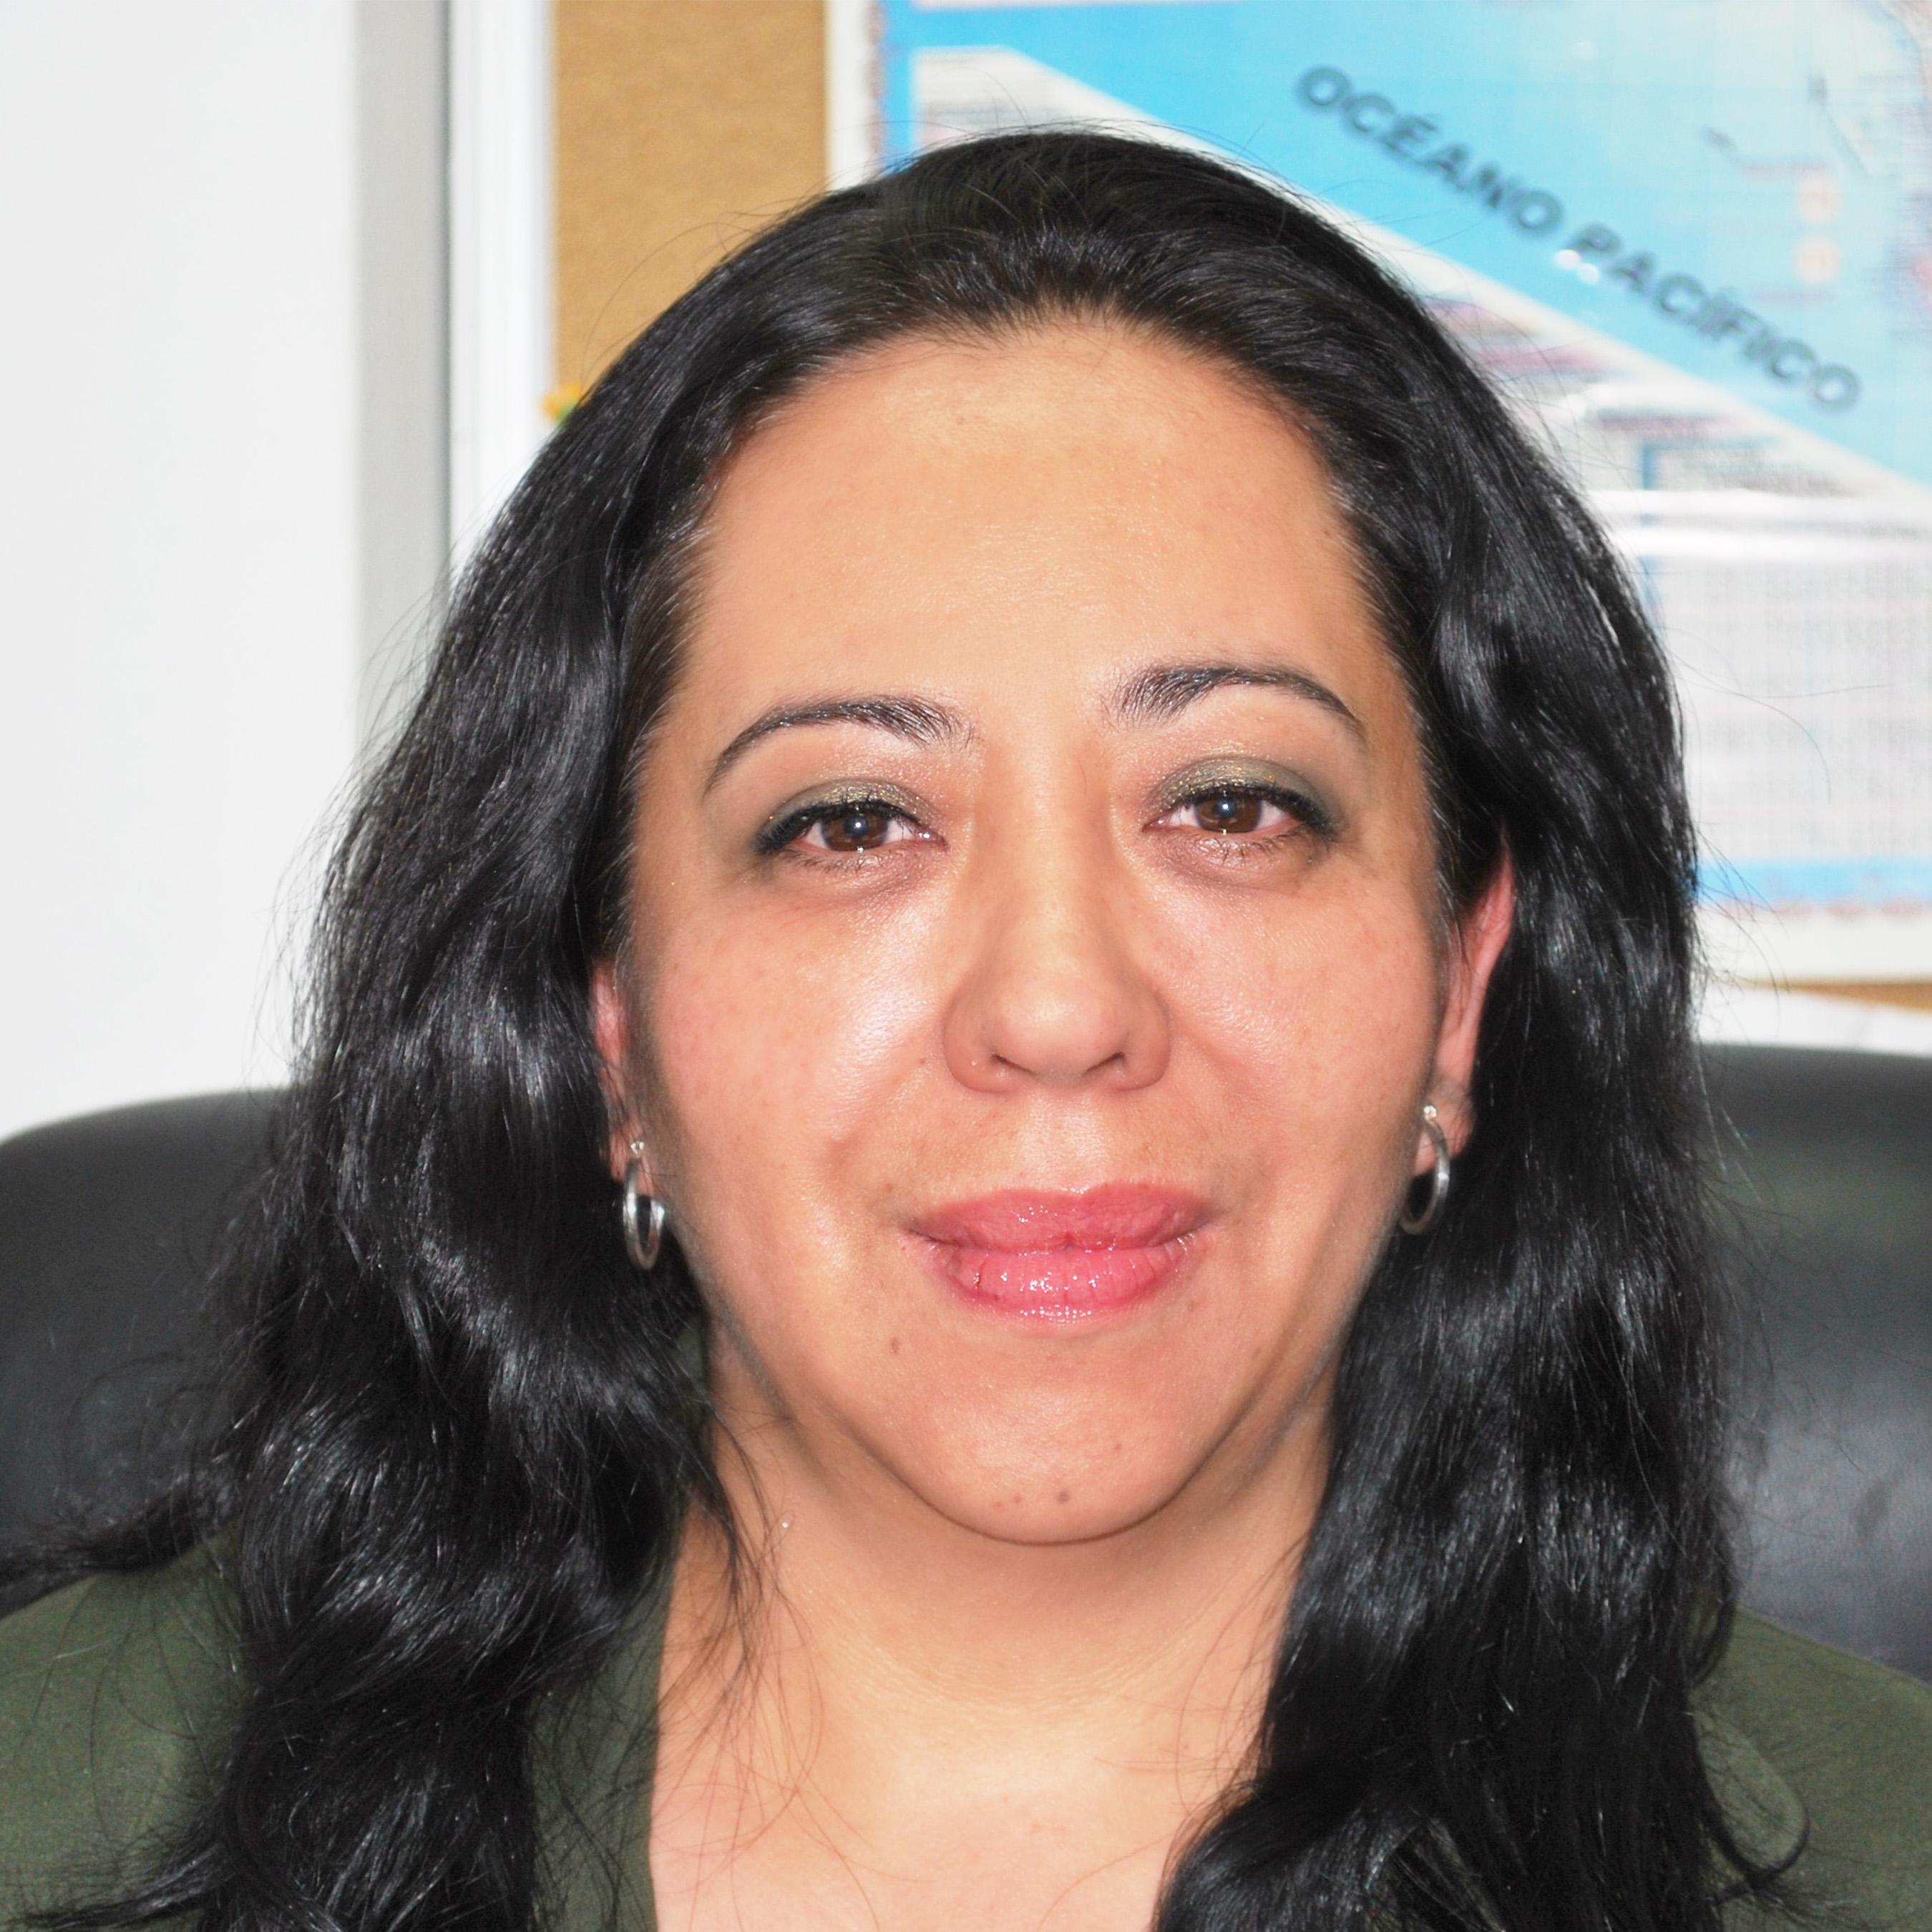 Lic. Edna María Luisa Corona Sánchez